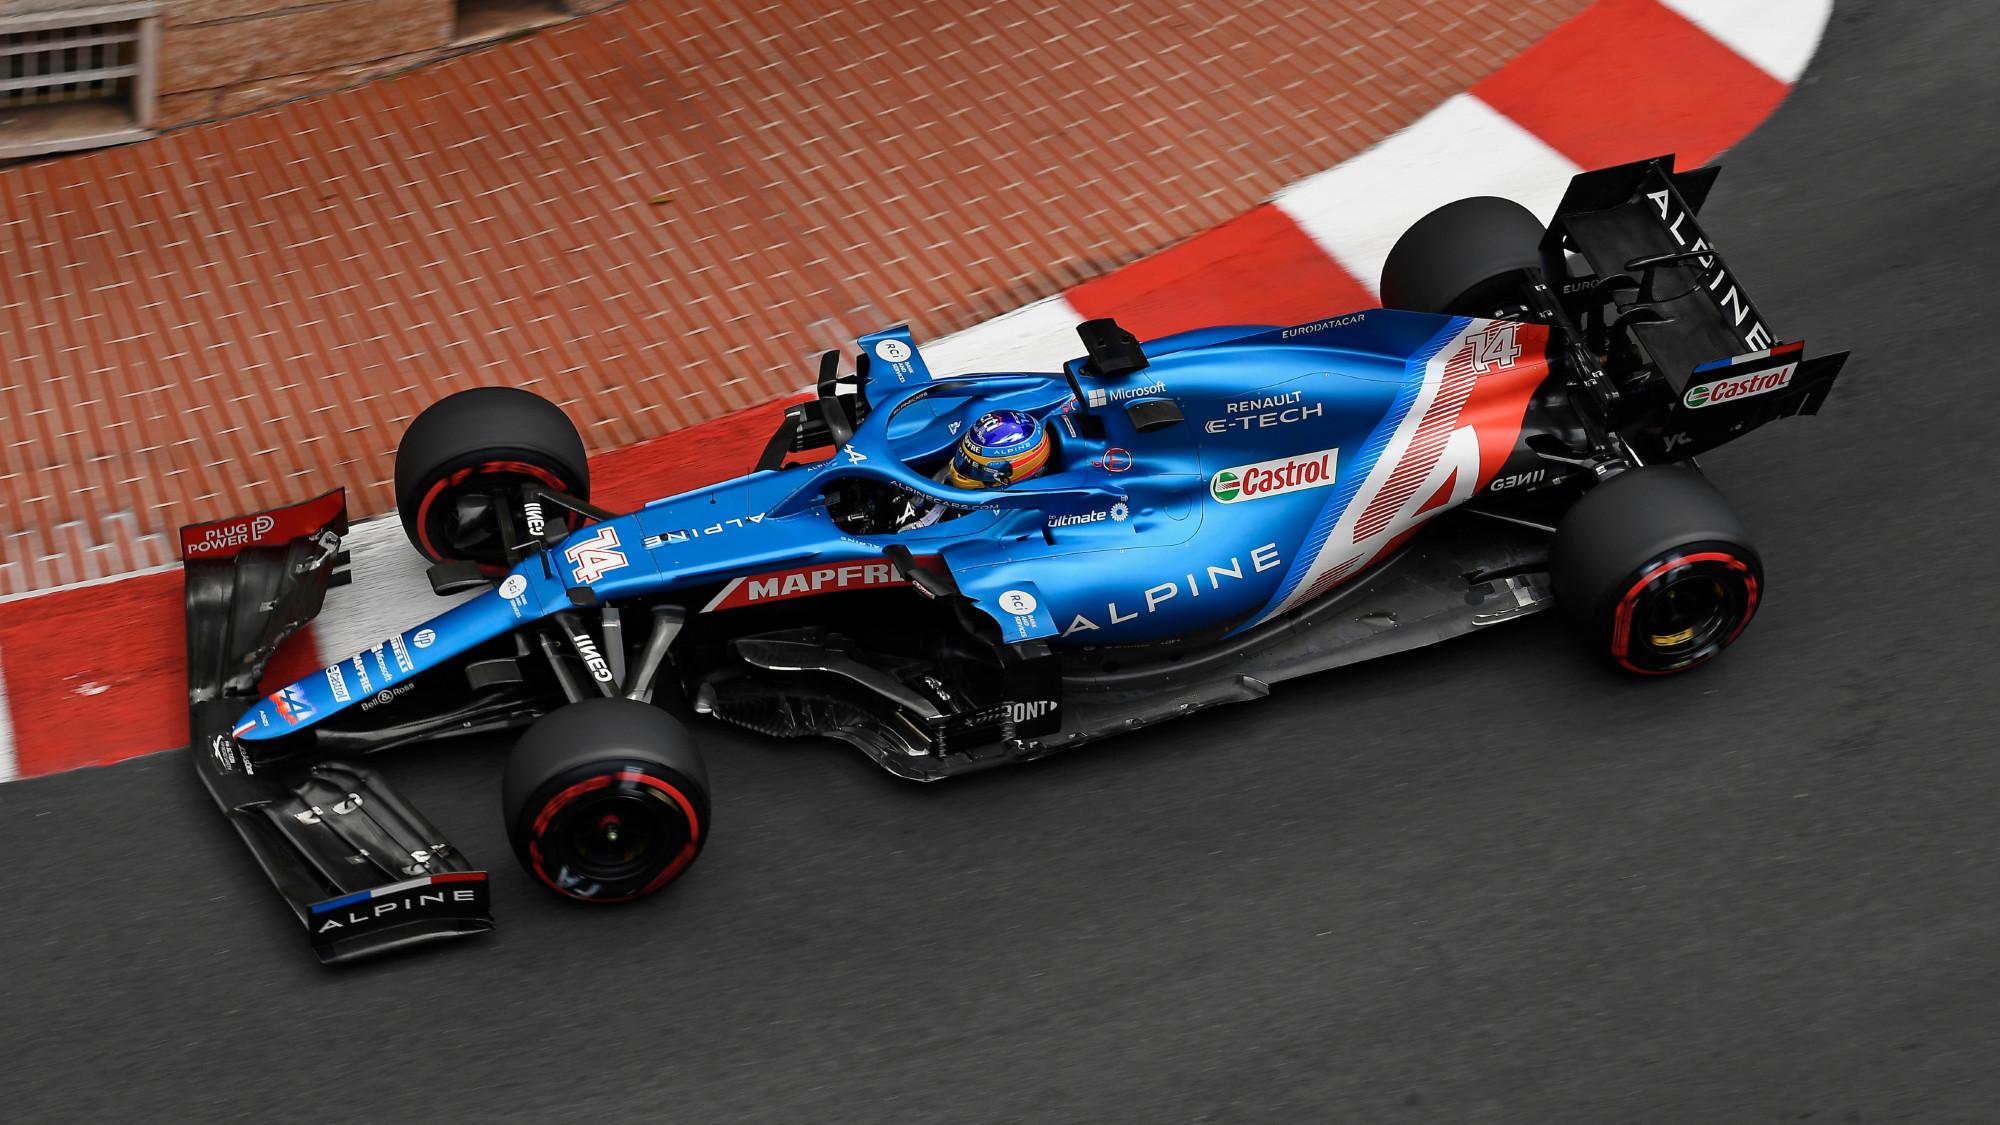 Fernando Alonso, 2021 Monaco GP